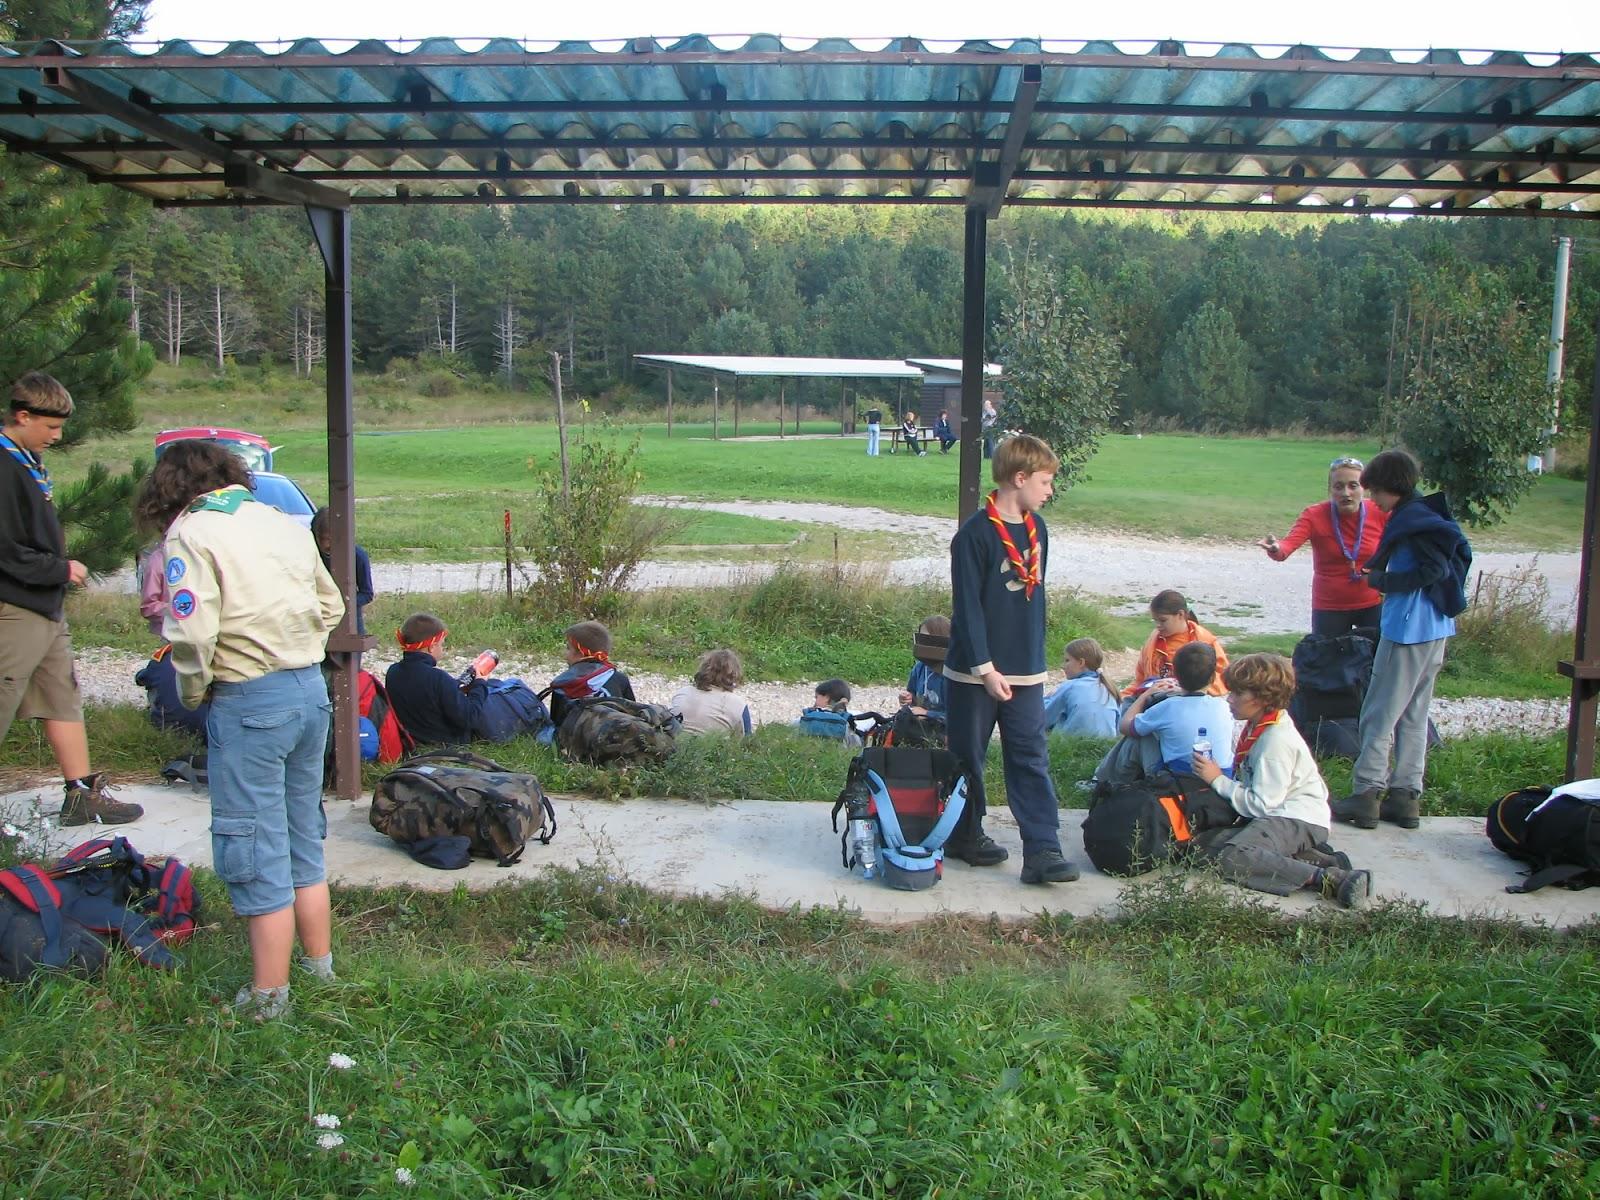 Vodov izlet, Ilirska Bistrica 2005 - Picture%2B015.jpg